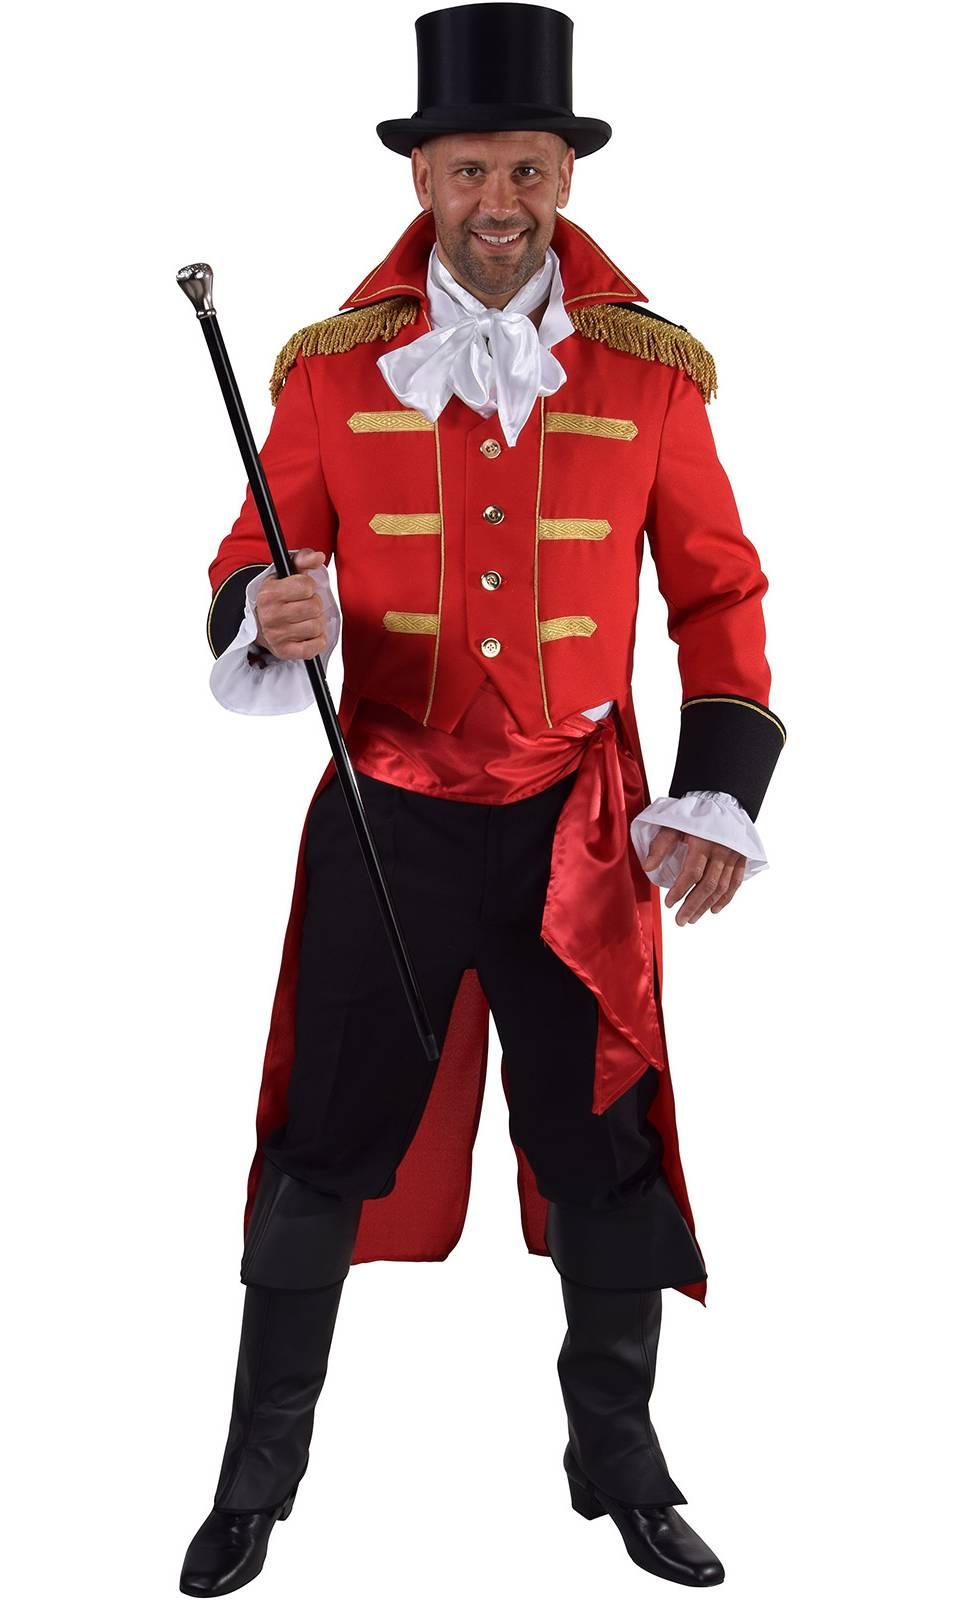 Costume de monsieur loyal grande taille